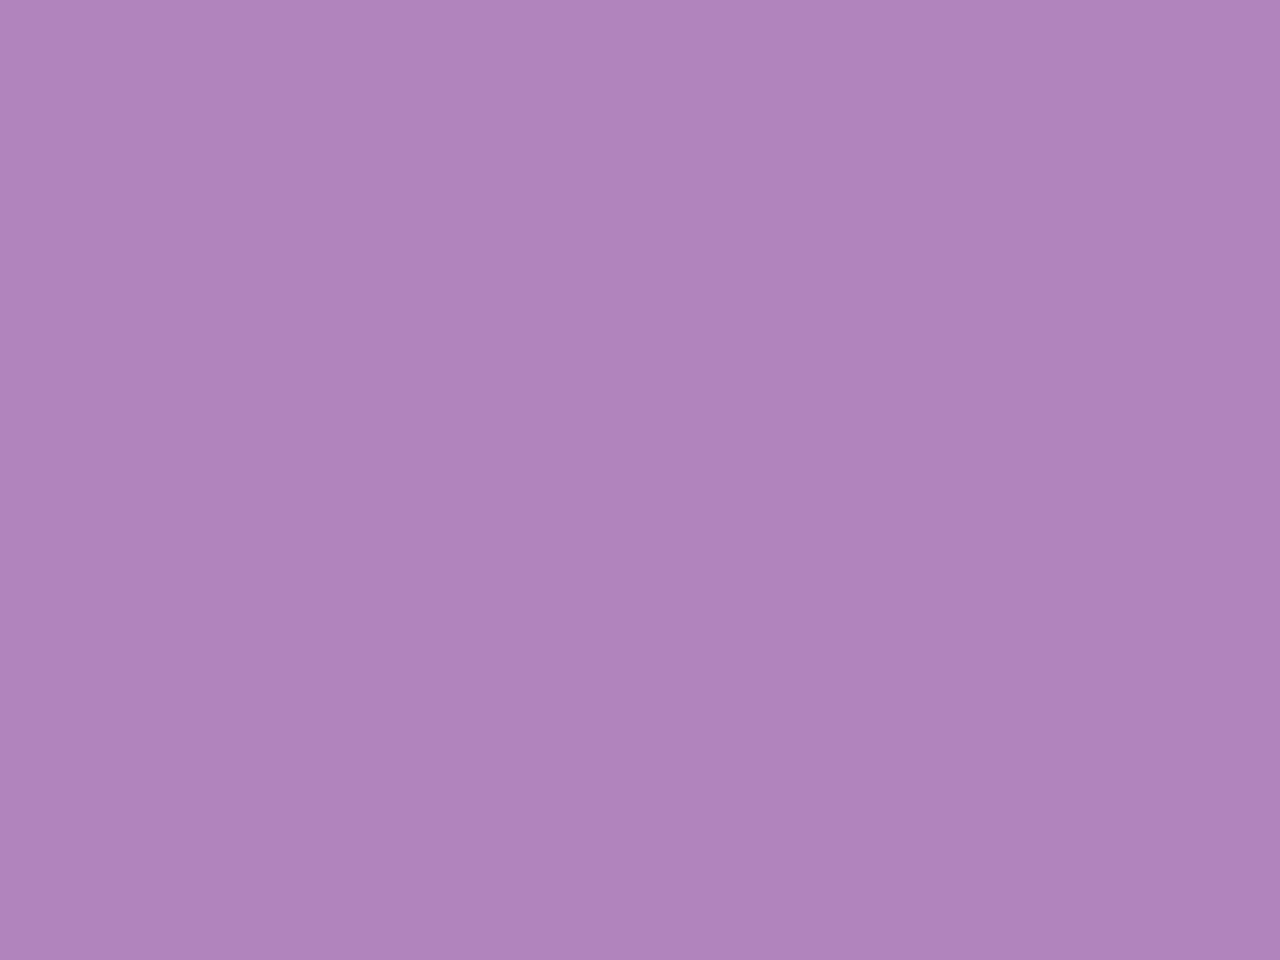 1280x960 African Violet Solid Color Background